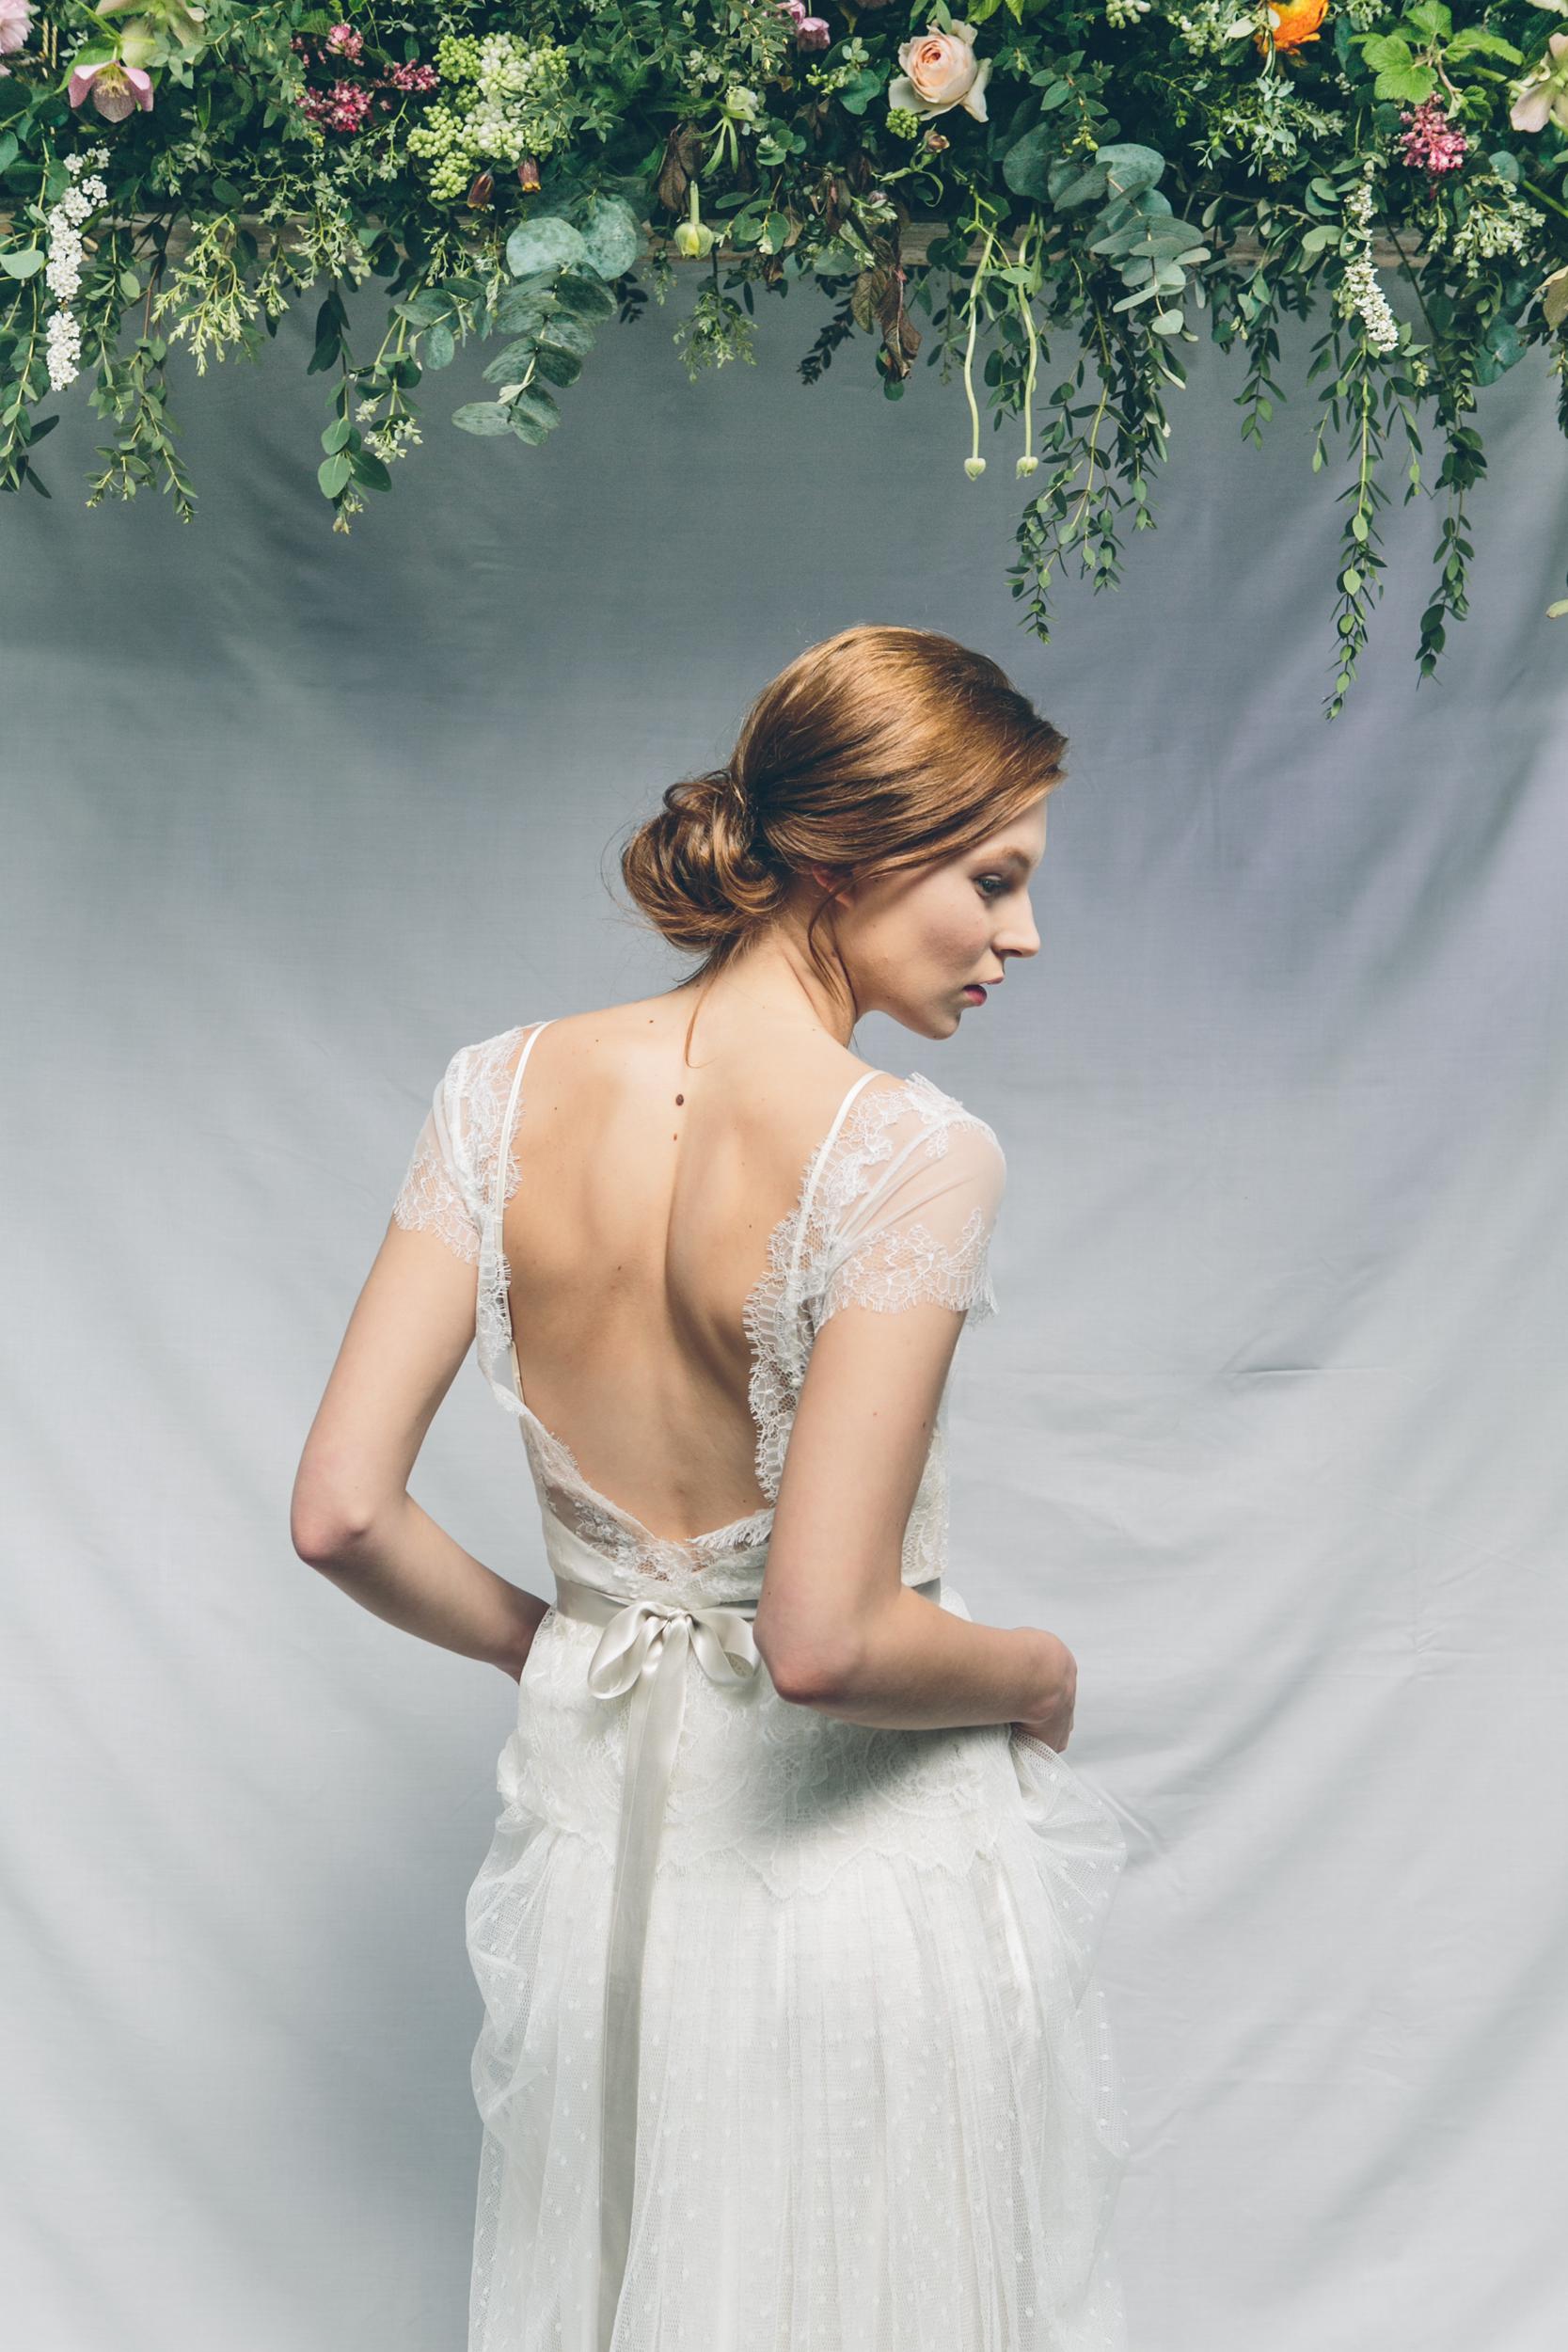 Kate-Beaumont-Wedding-Dresses-Sheffield-13.jpg